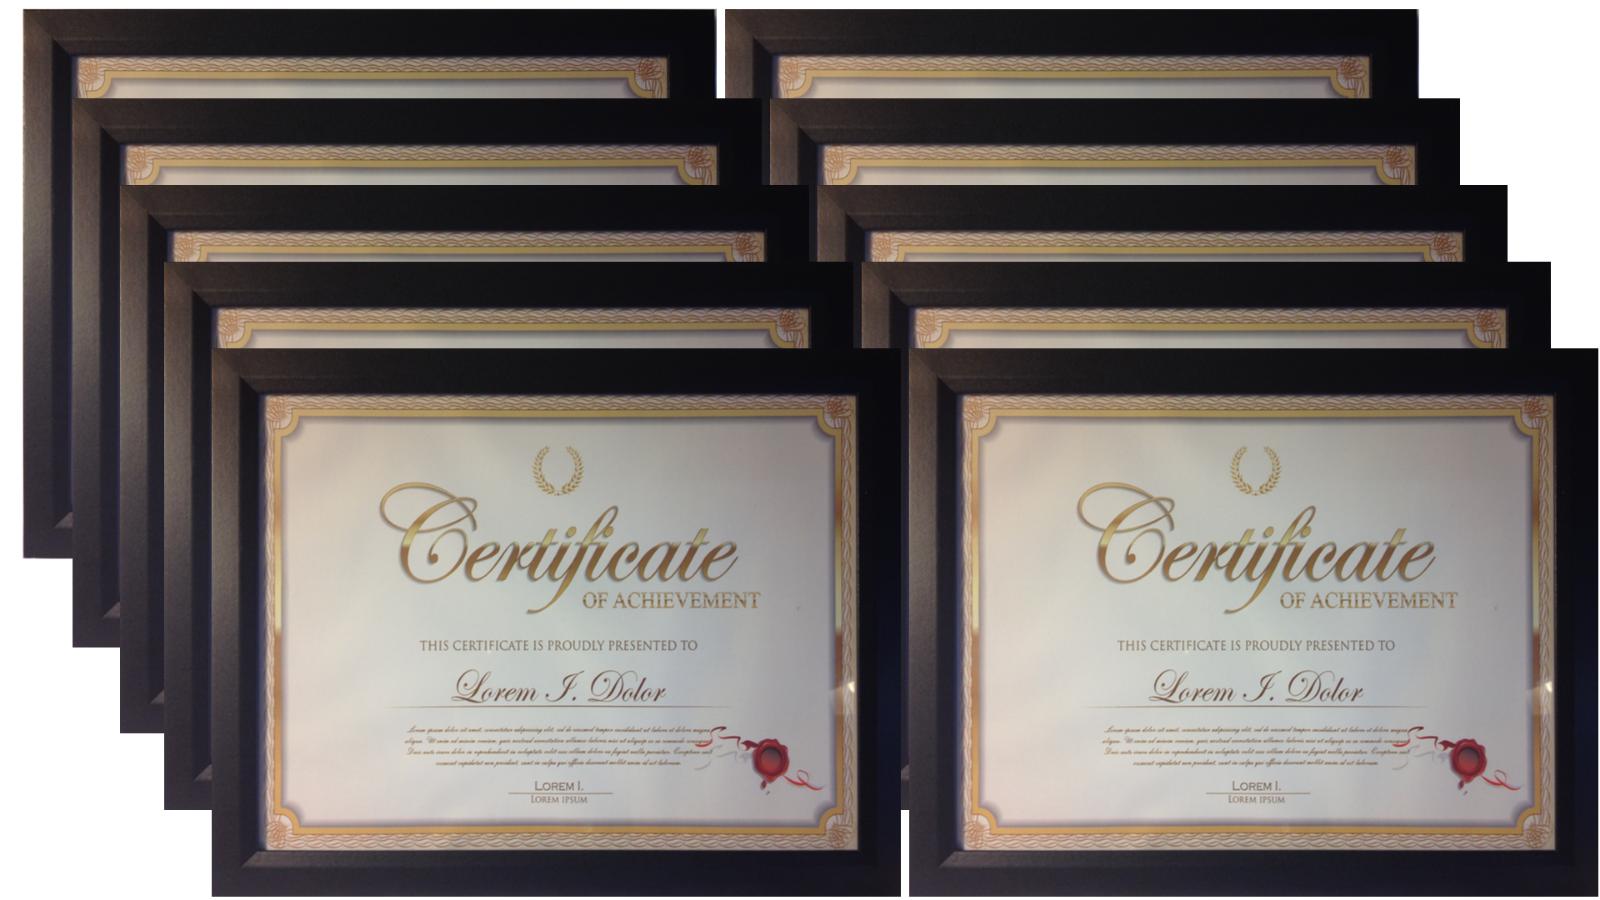 Frame Amo 8.5x11 Black Wood Certificate Frames, Glass Front,